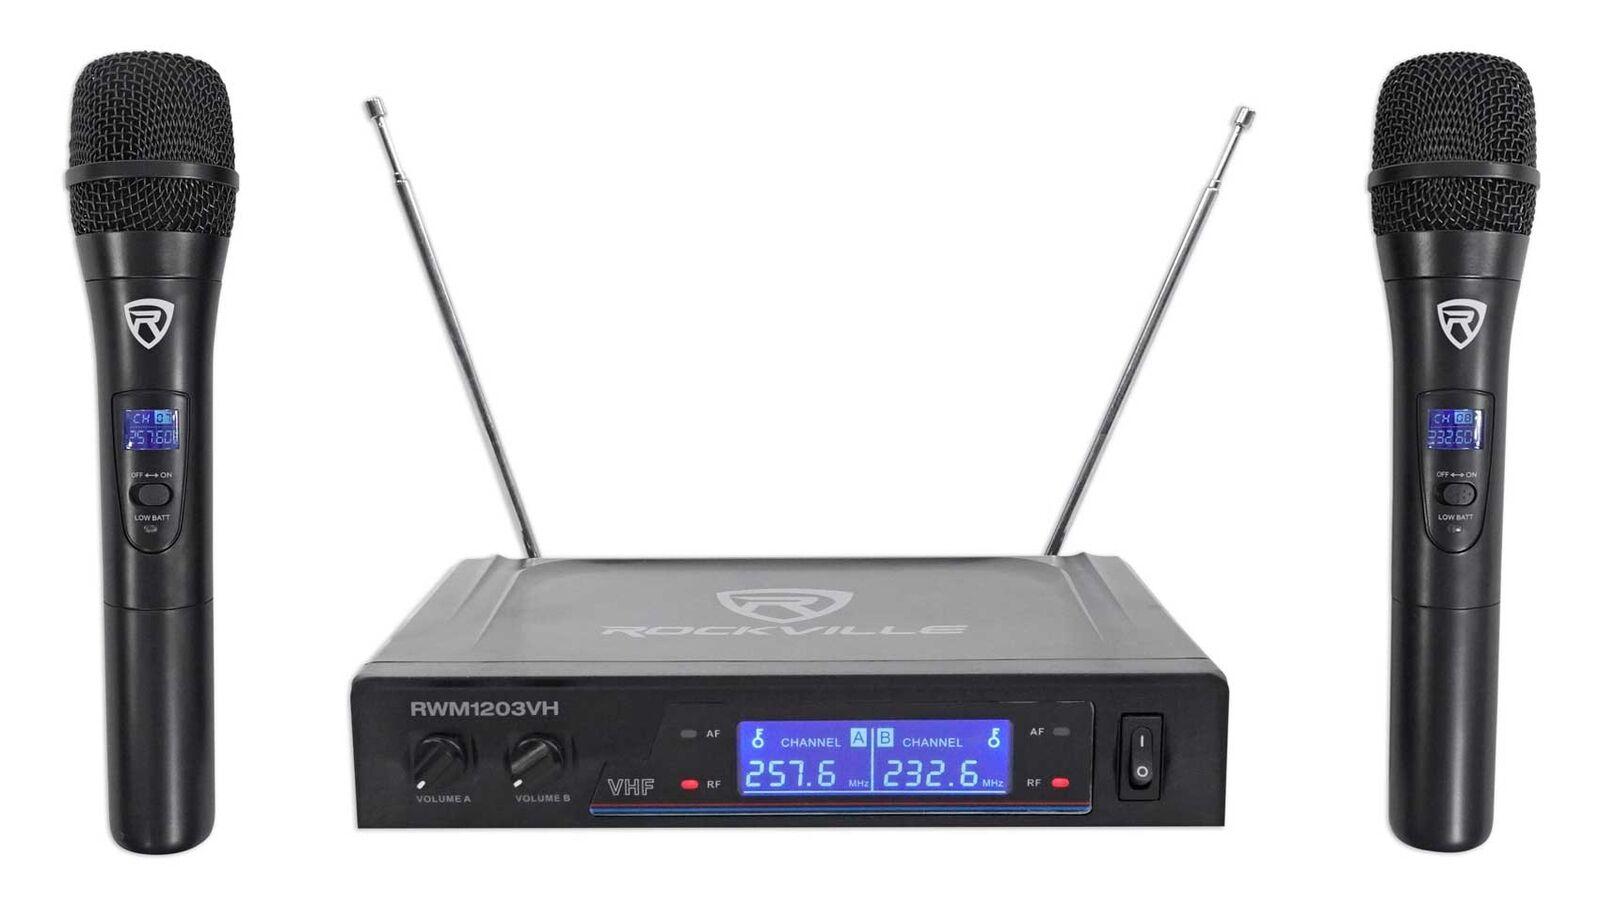 Rockville RWM1203VH VHF Wireless Dual HandHeld Microphone System/Digital Display